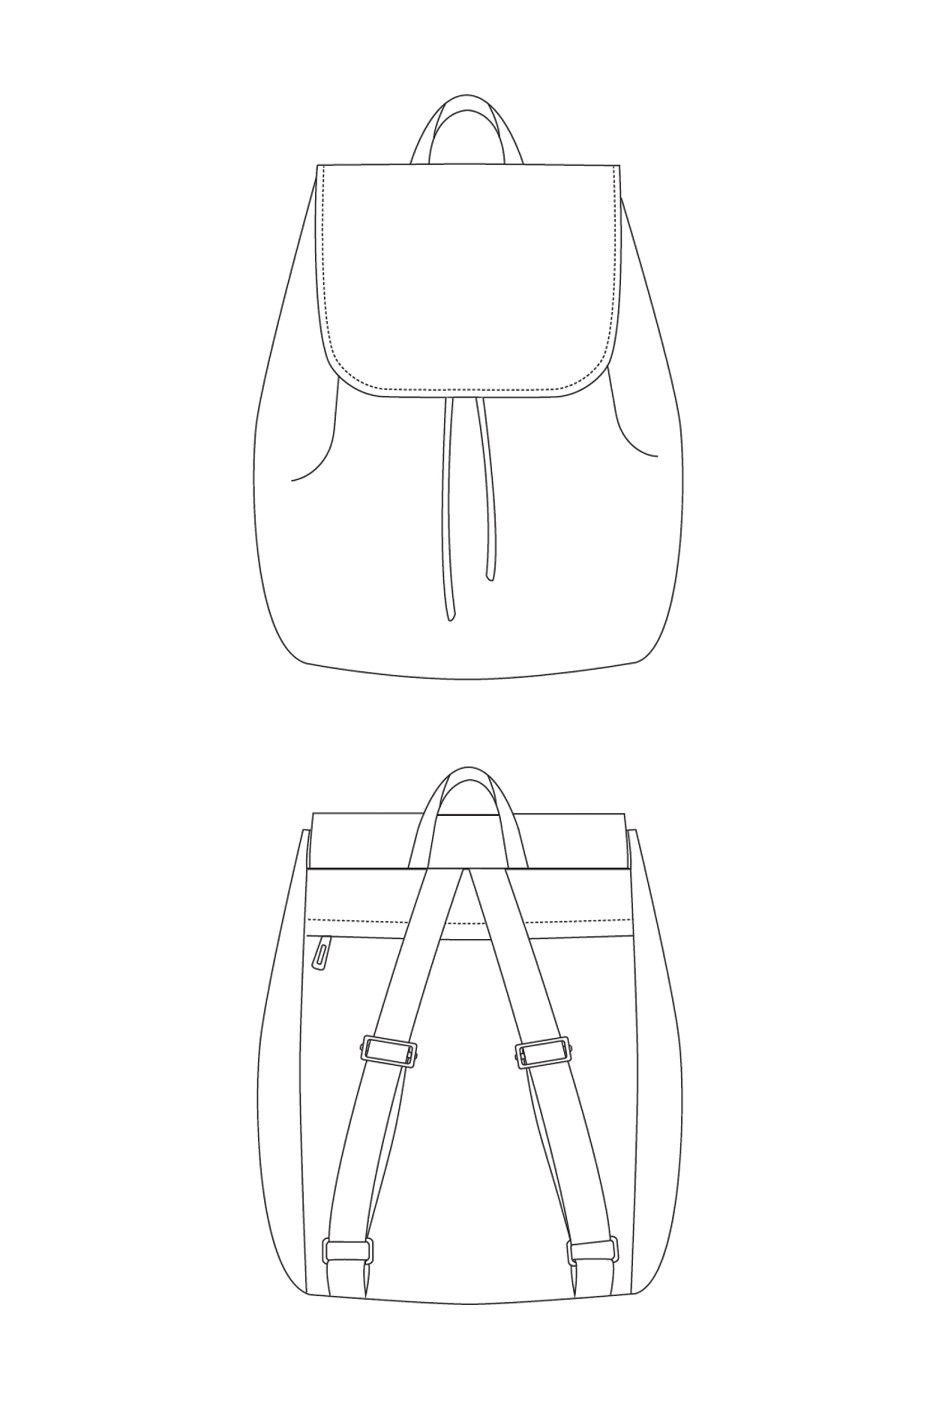 London Backpack Sewing Pattern by LBG Studio   Turnbeutel, Rucksäcke ...